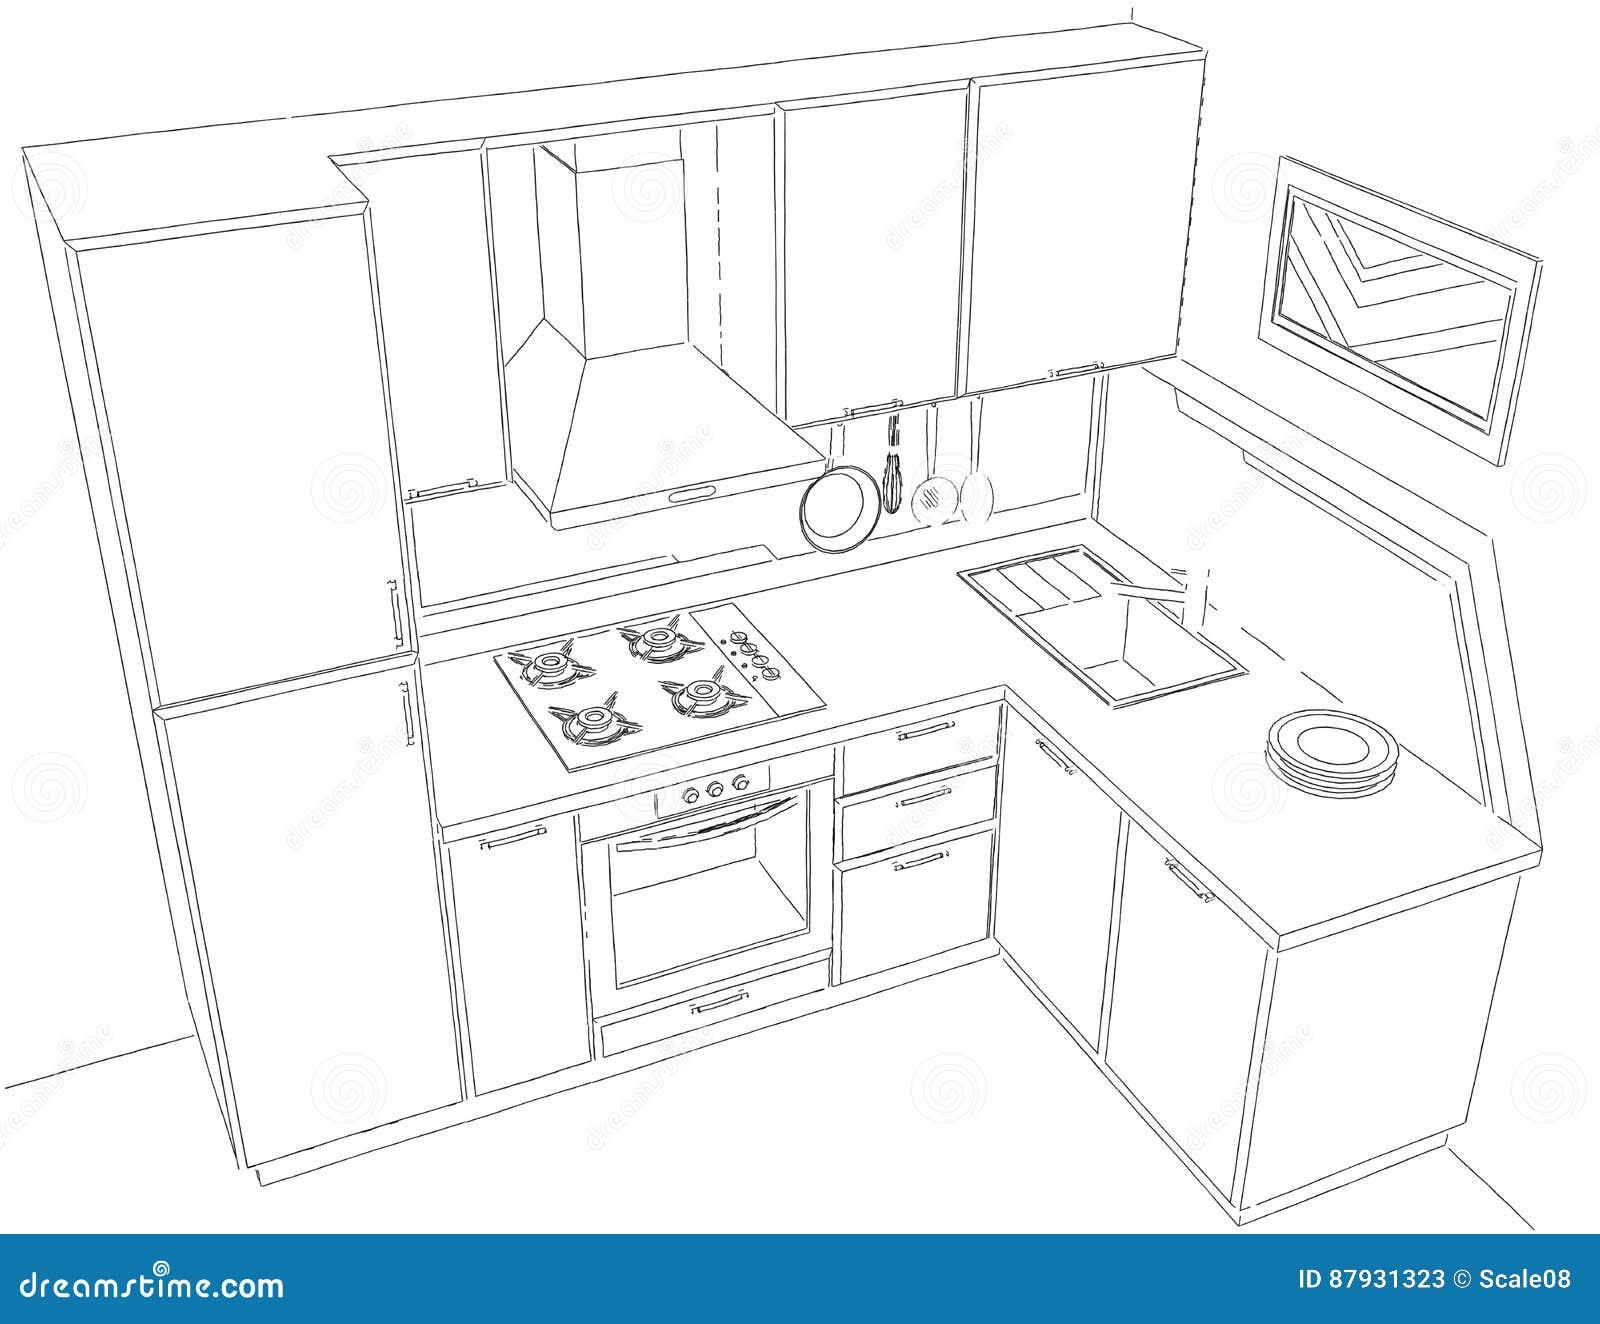 Modern corner kitchen interior pencil drawing